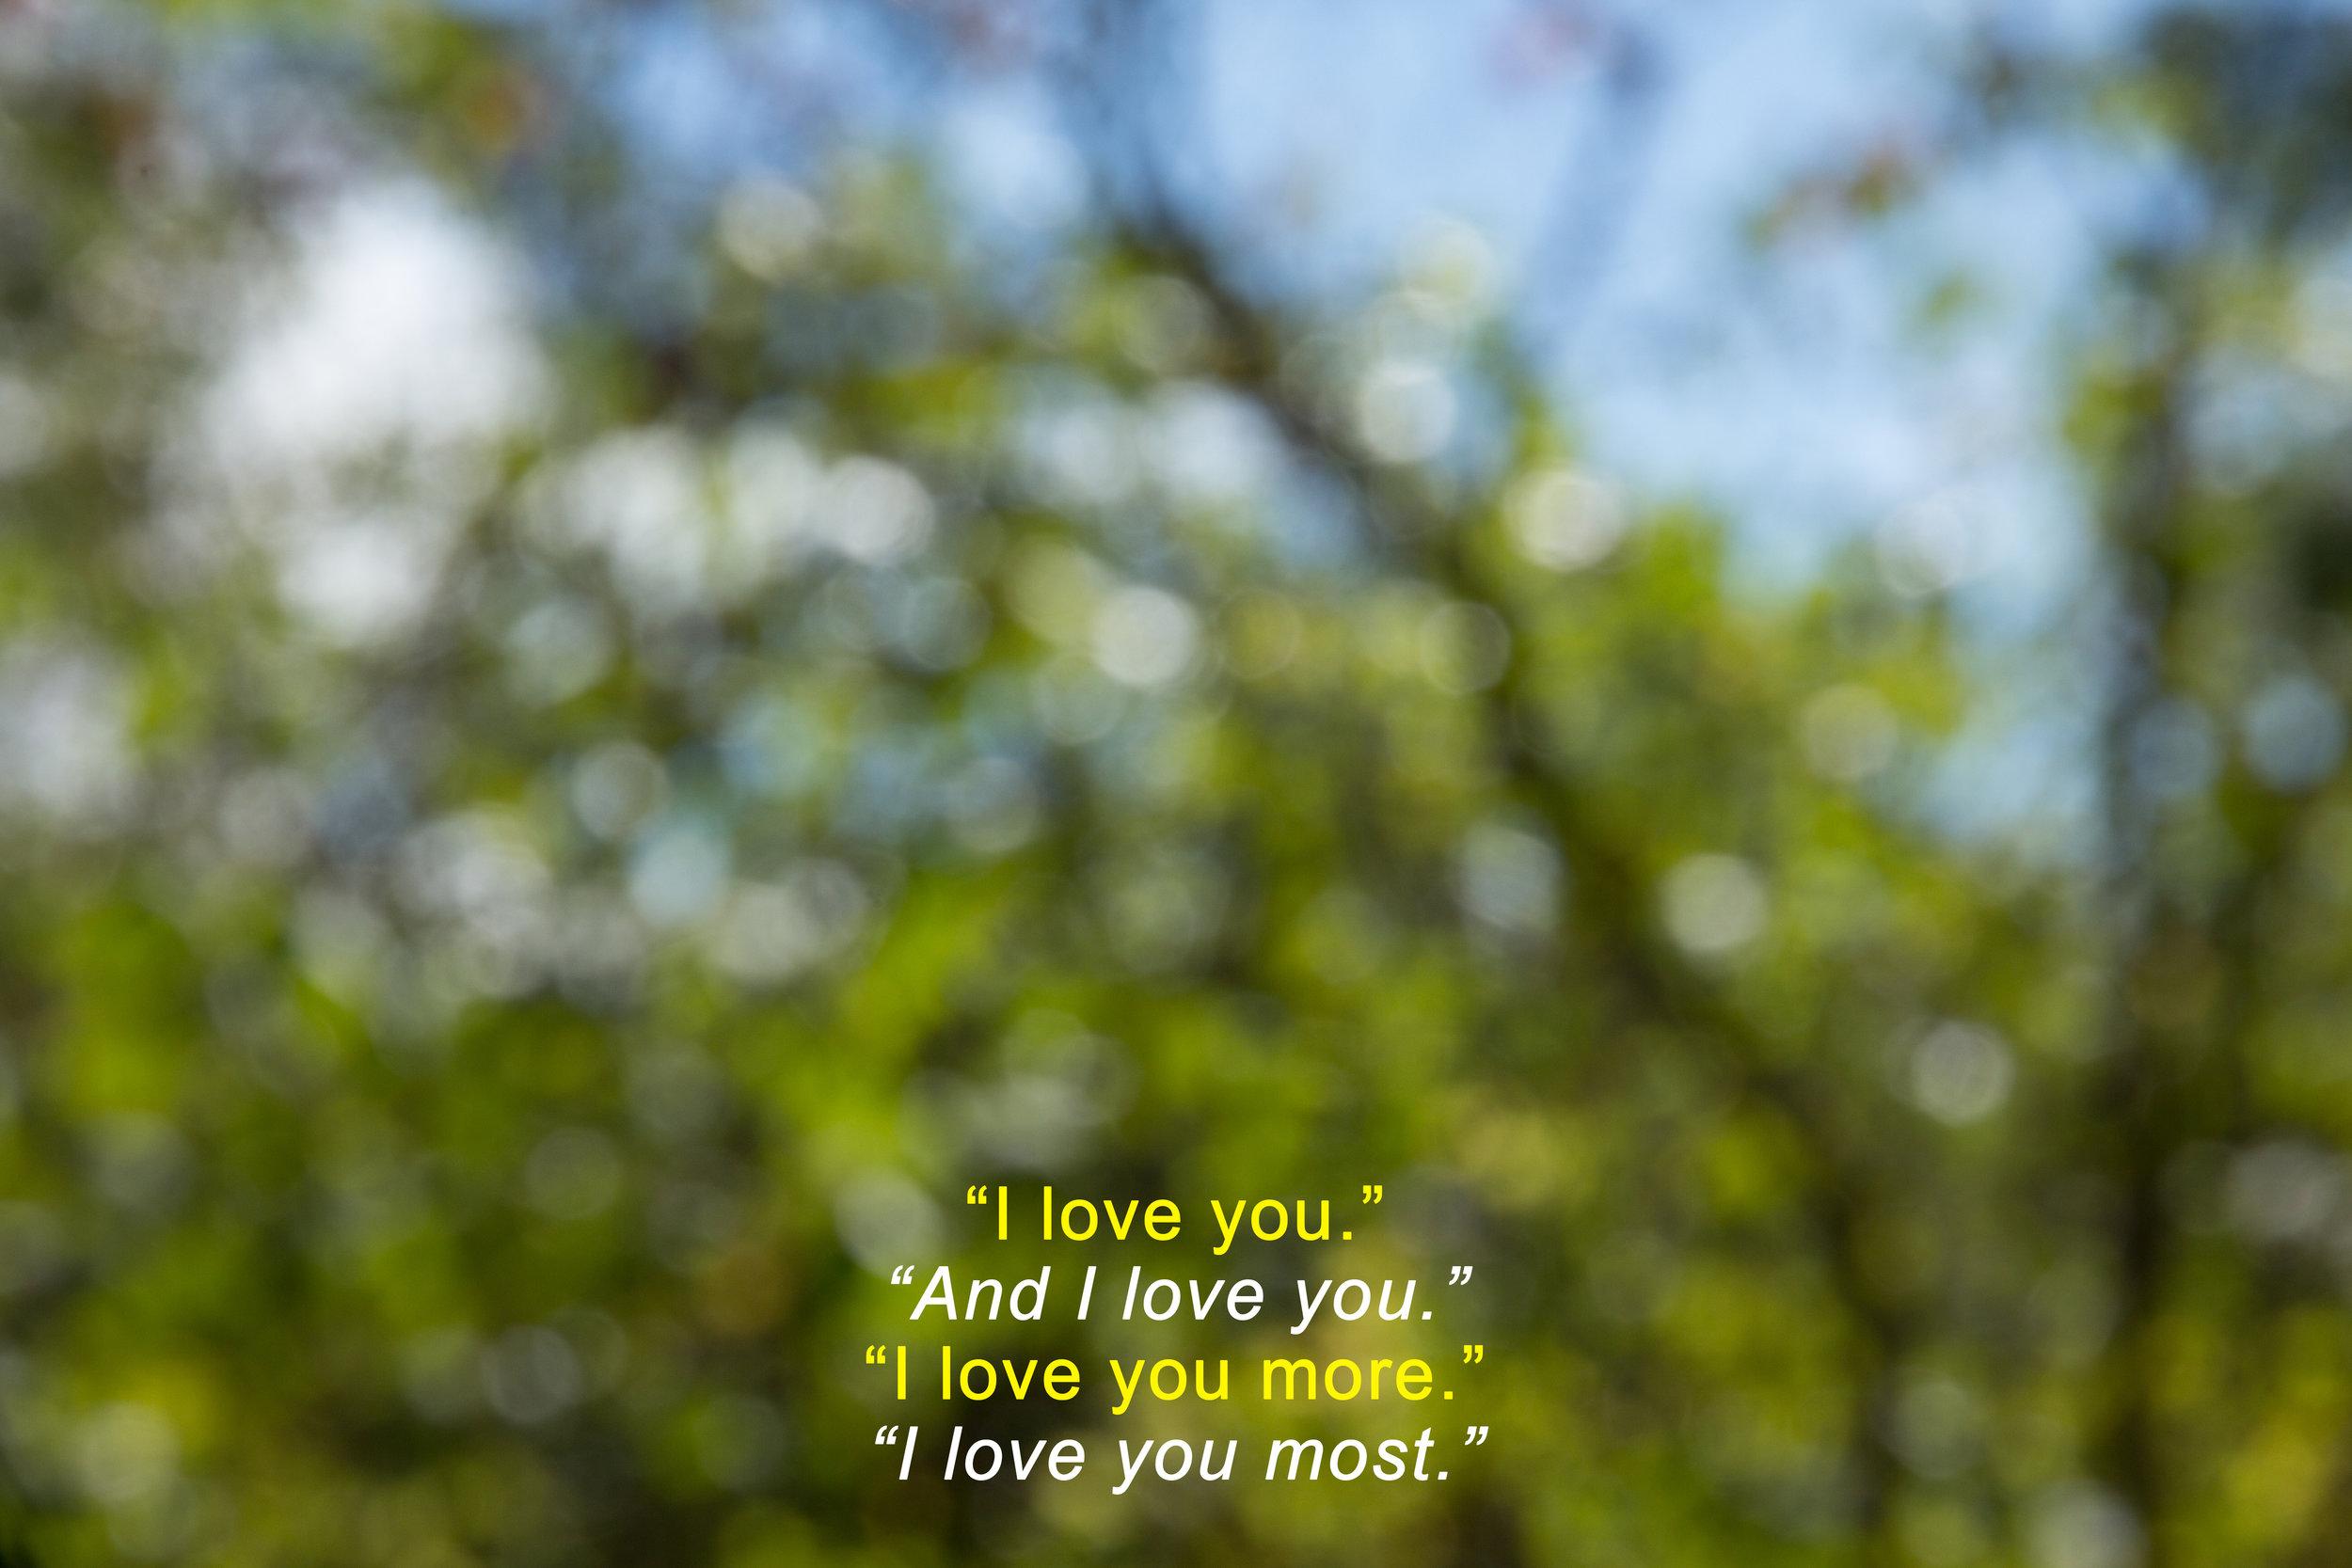 I love you most.jpg